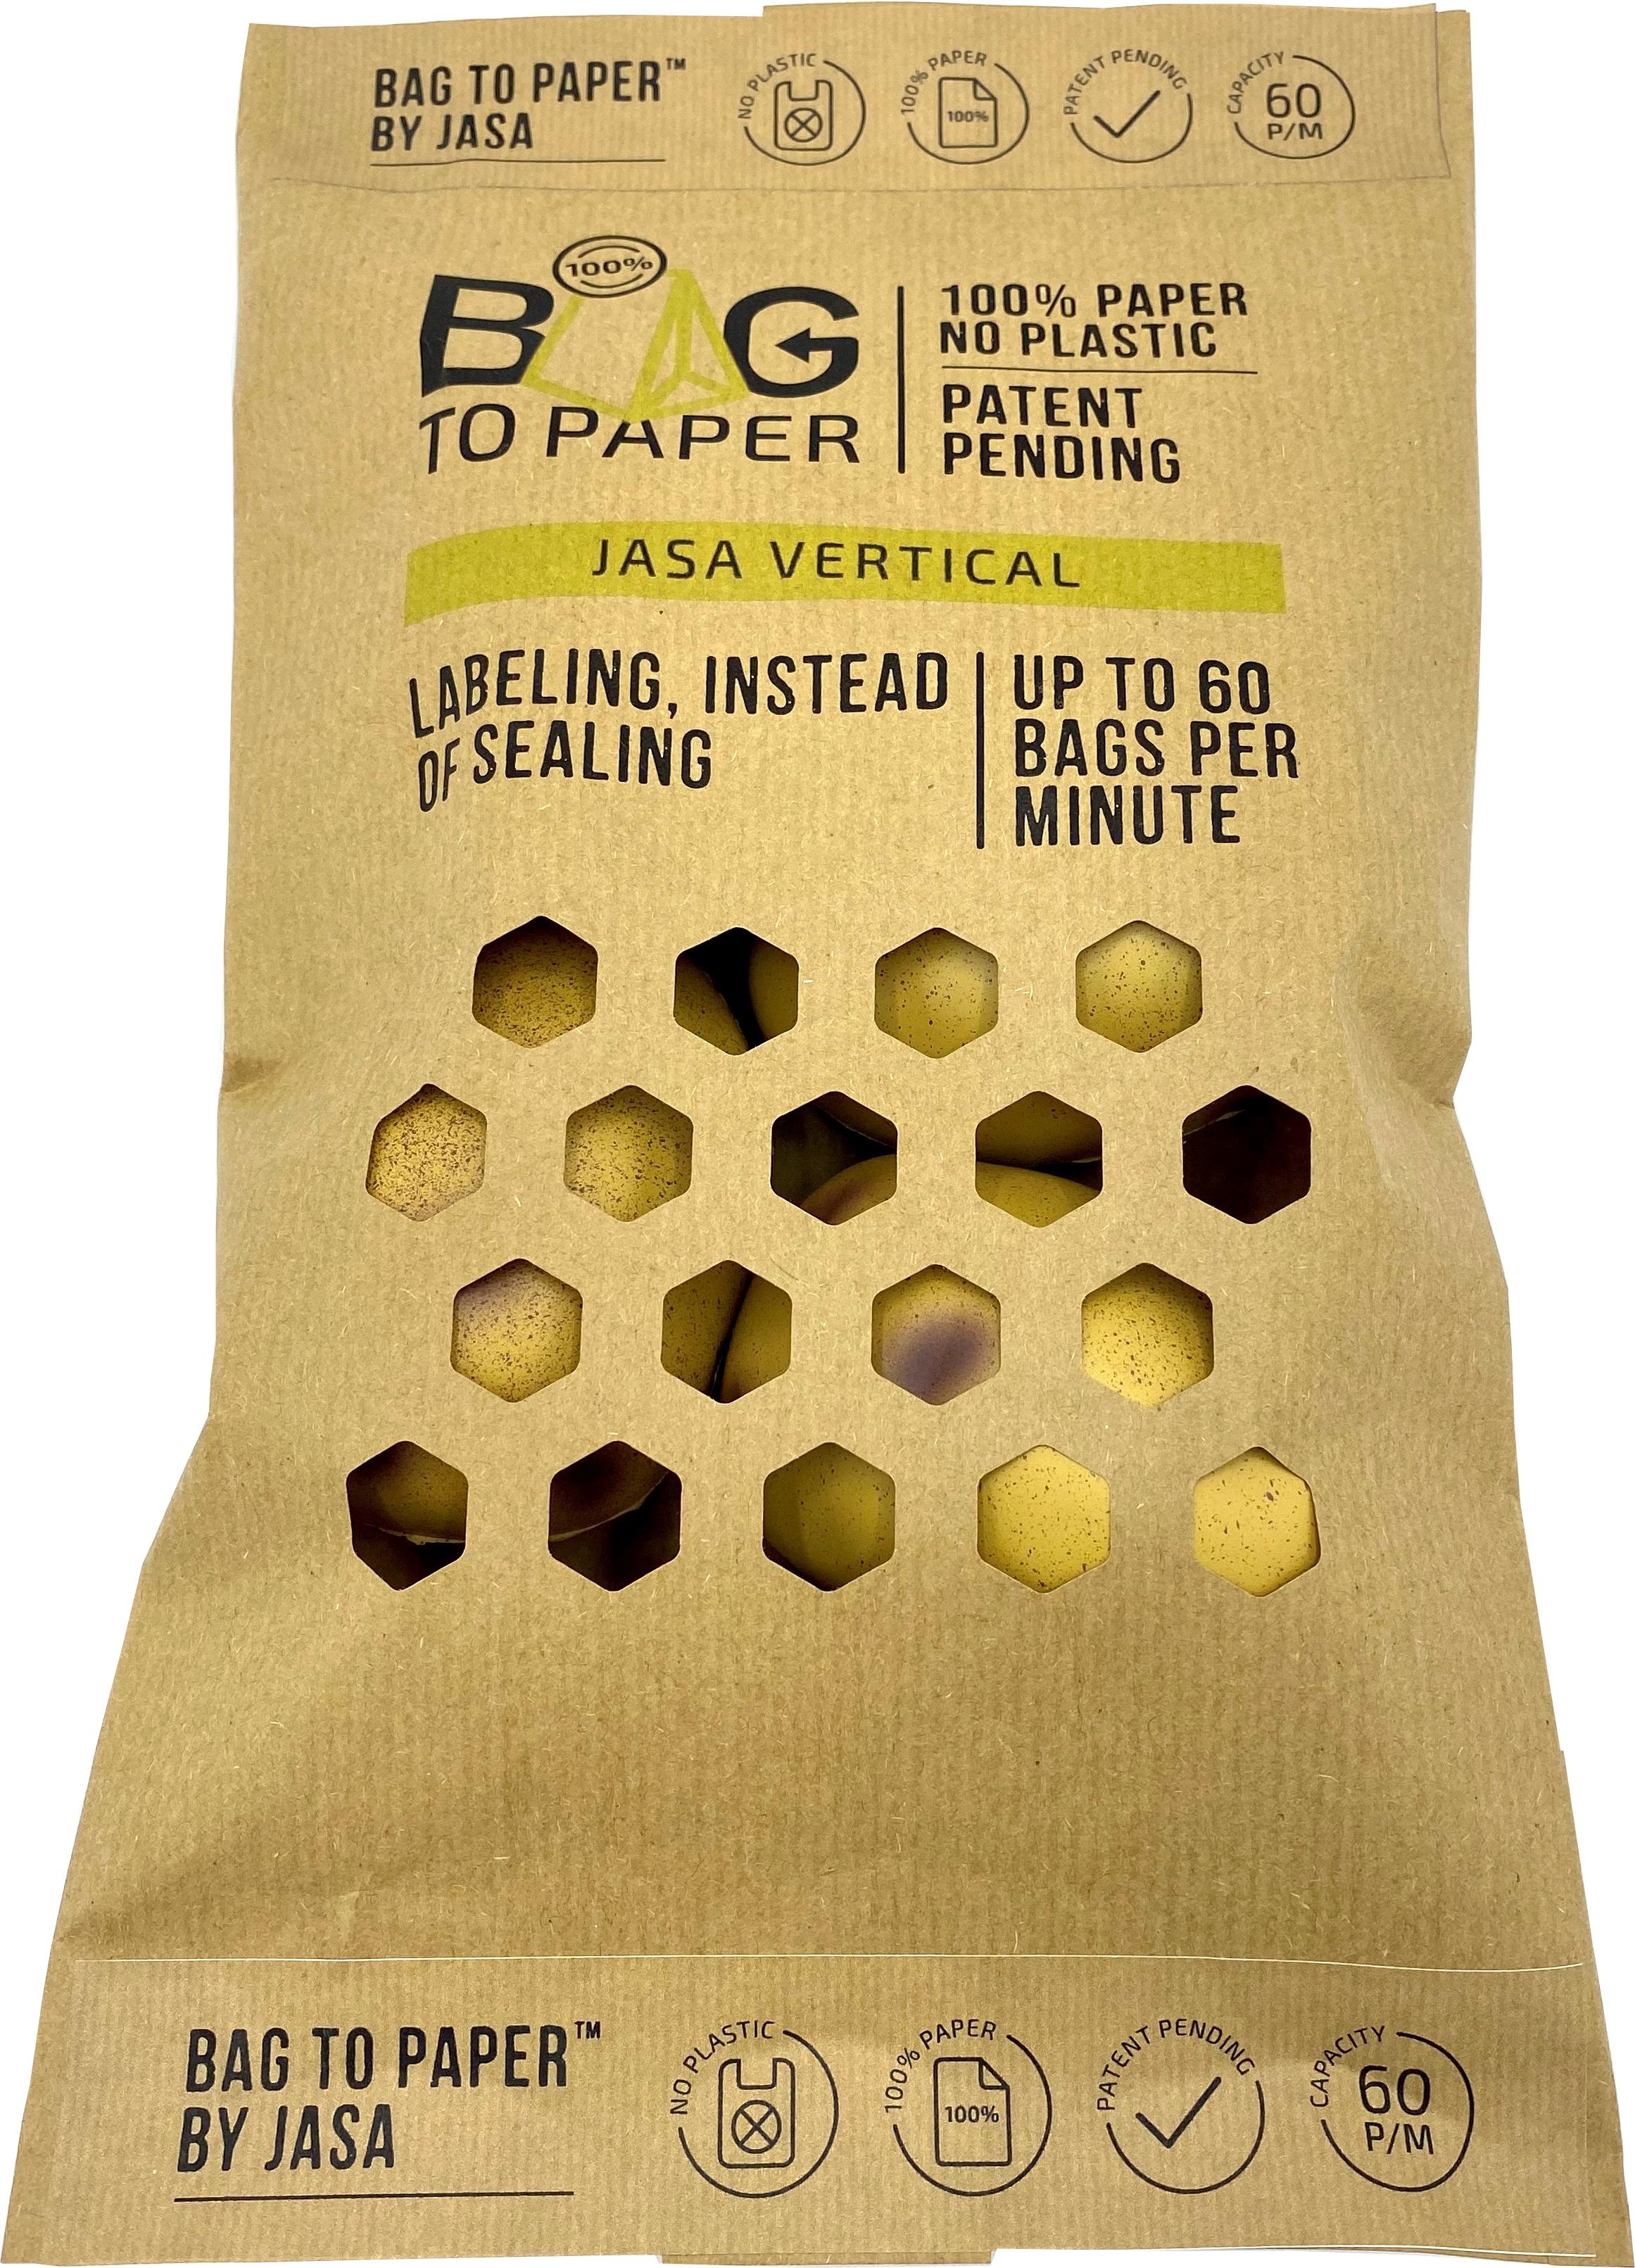 Bag-2-Paper-potatoes